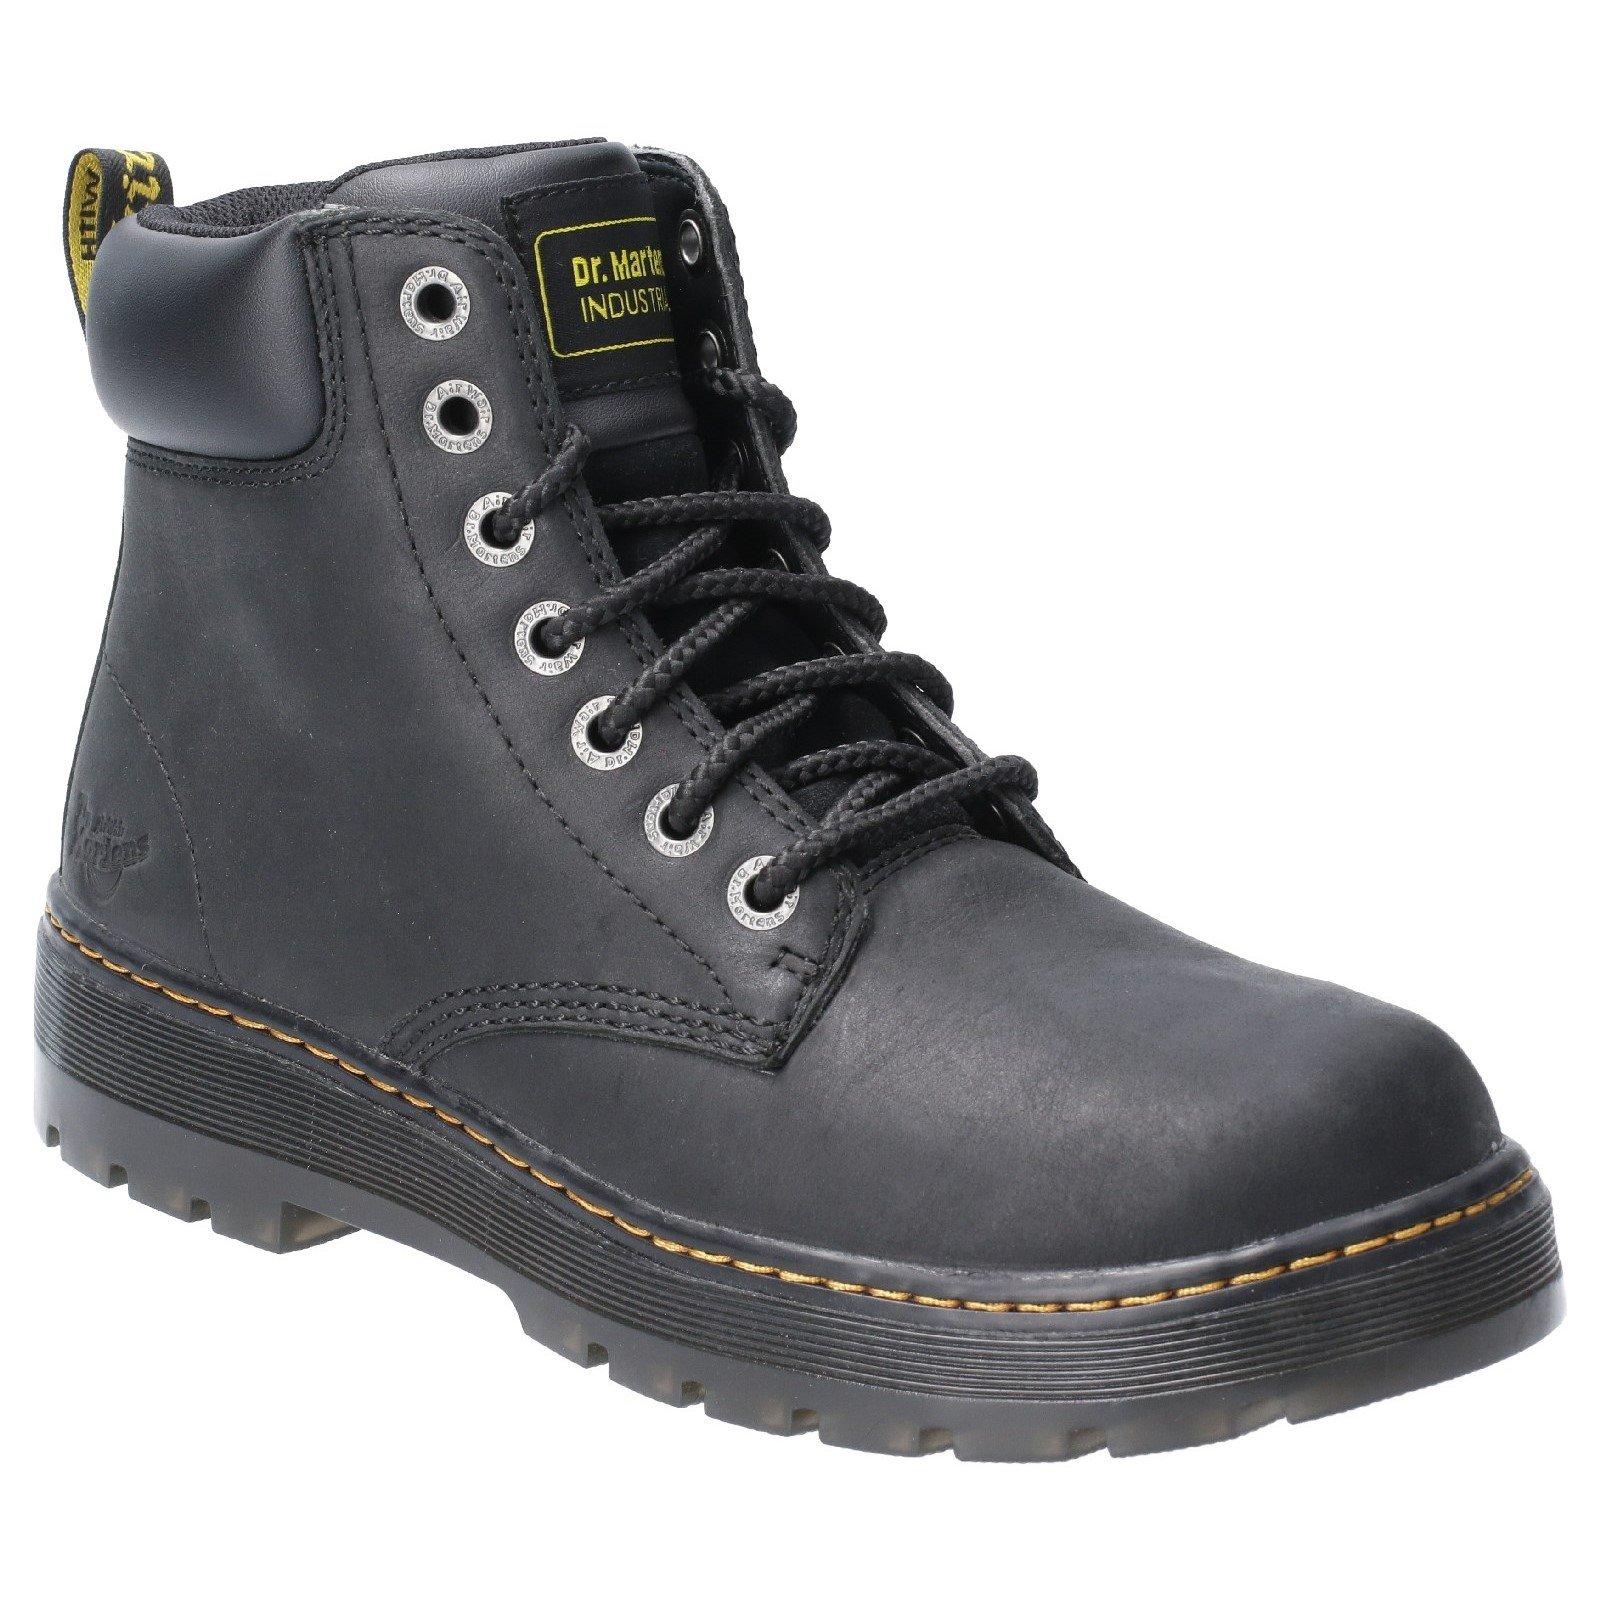 Dr Martens Men's Winch Non-Safety Work Boot Black 29821 - Black 10